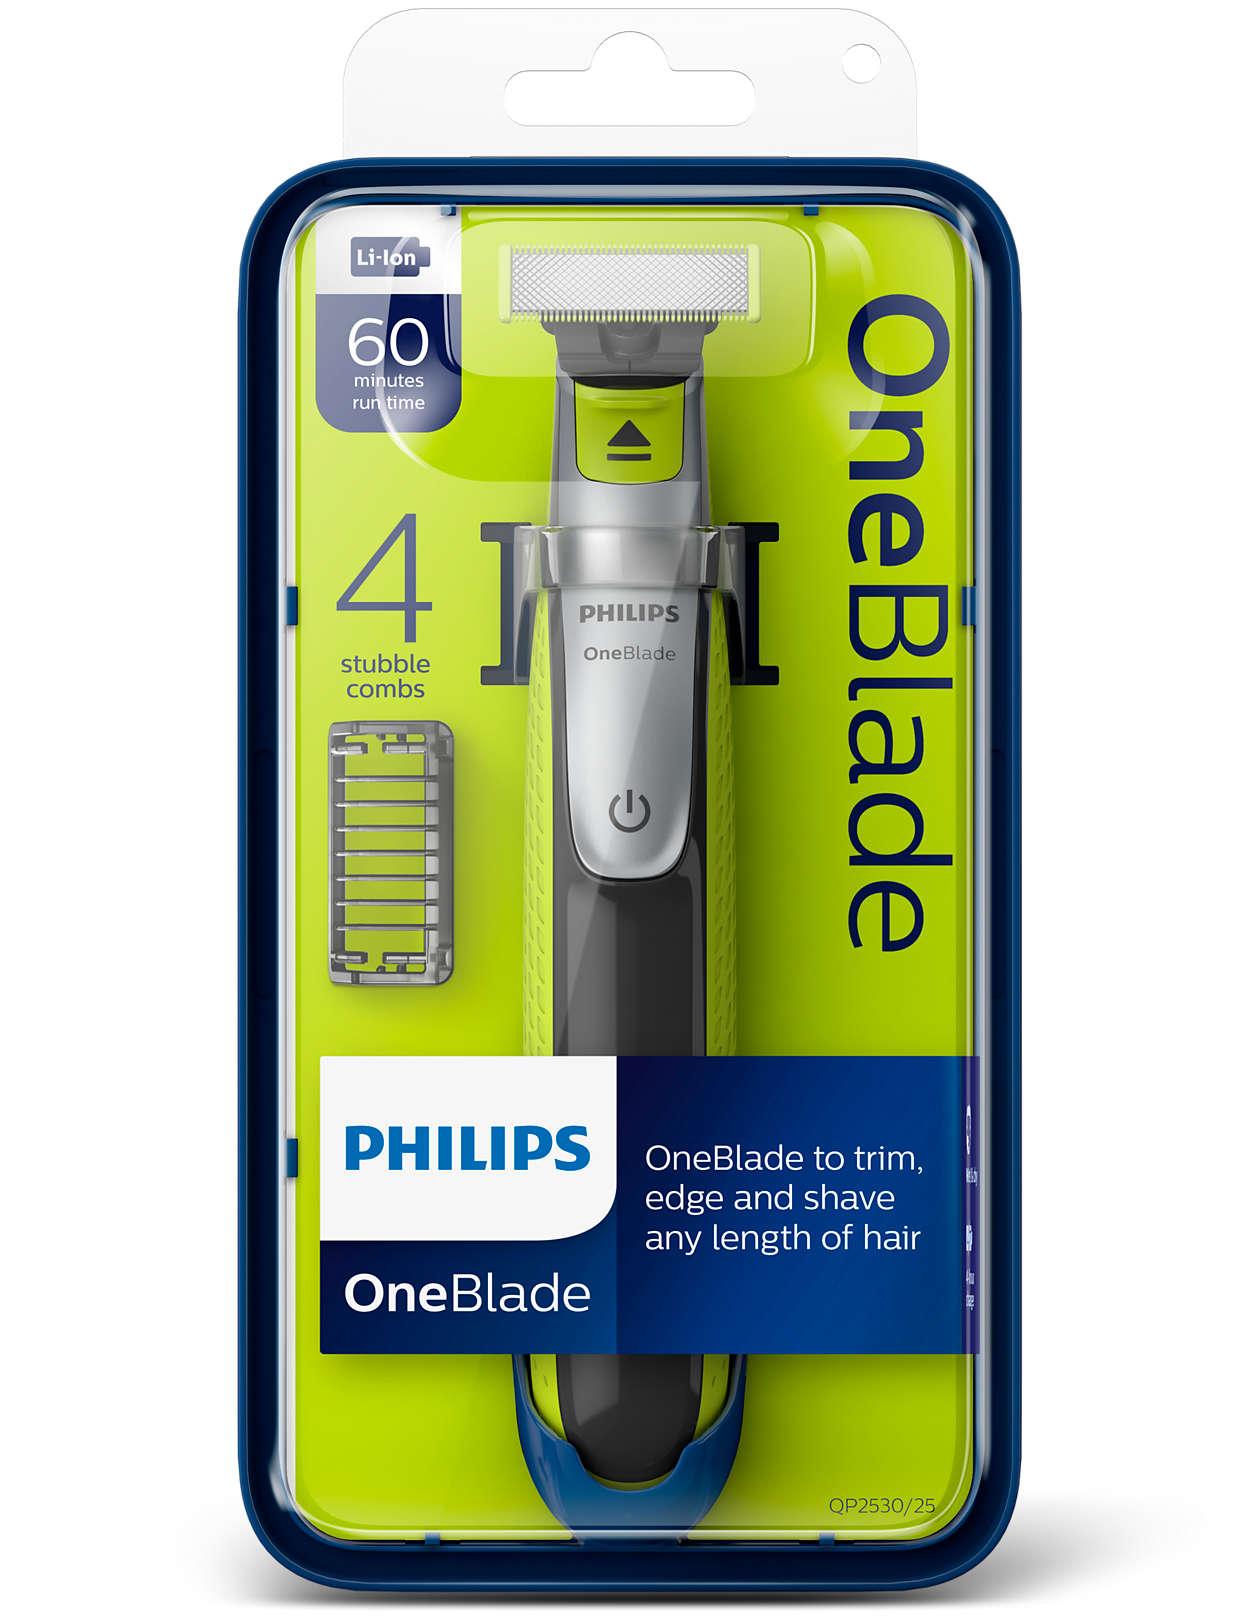 Phillips OneBlade QP2530/25